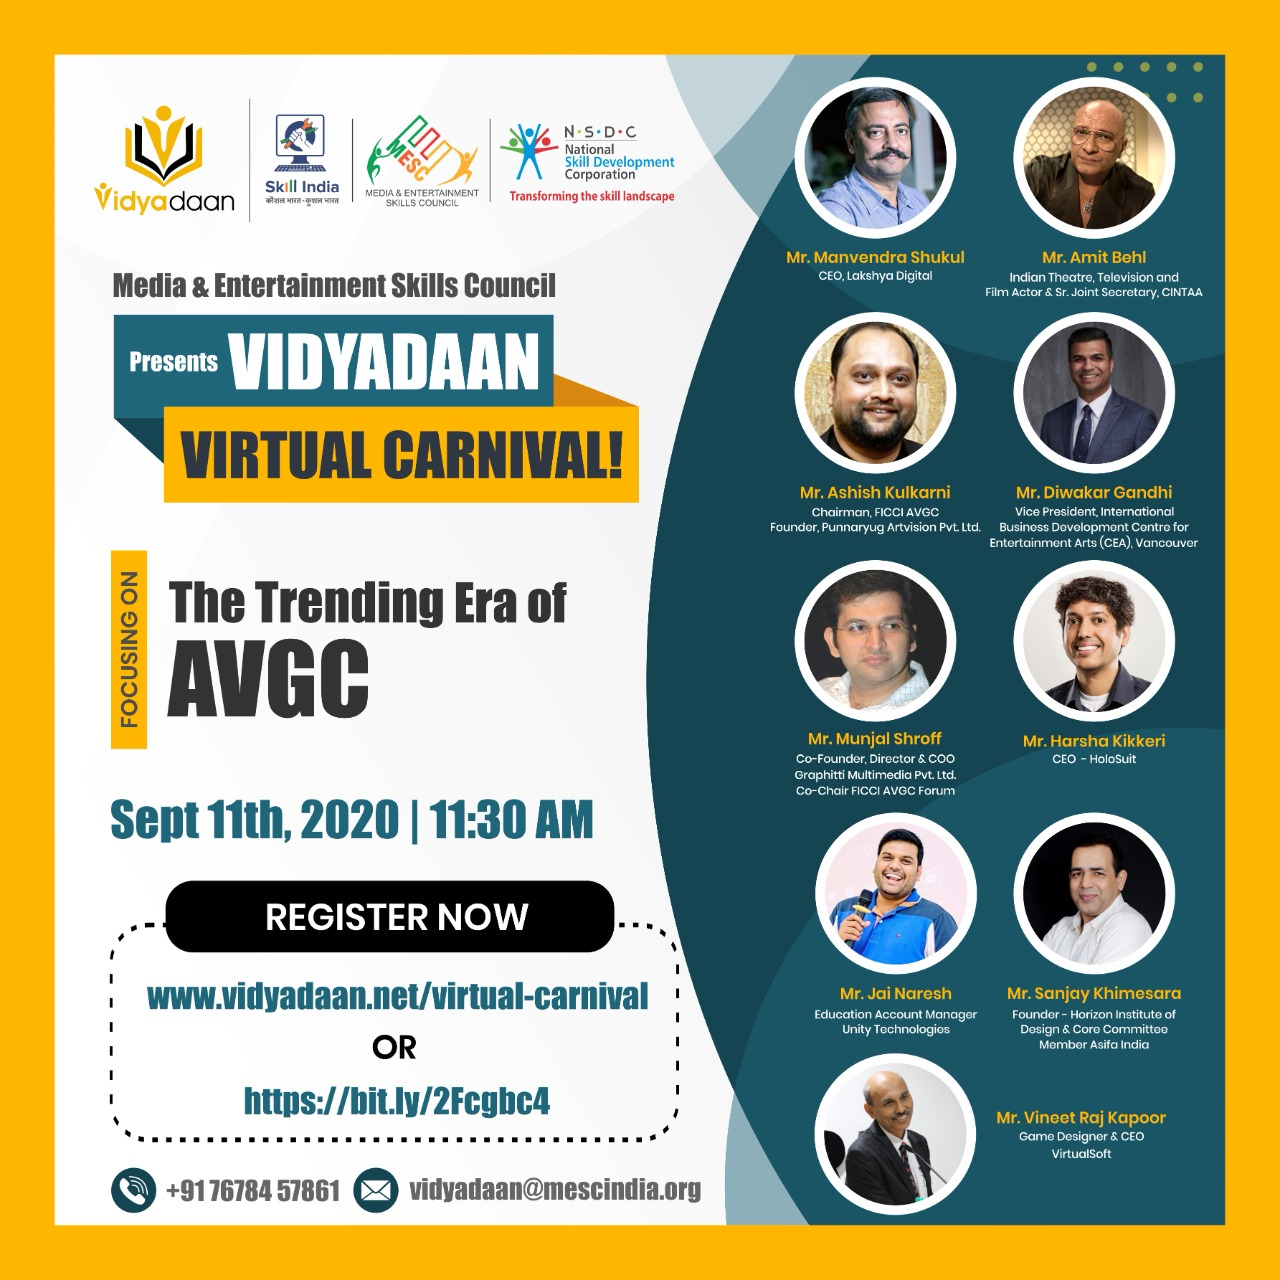 The Trending Era of AVGC - Speaker Vineet Raj Kapoor Vidyadaan carnival